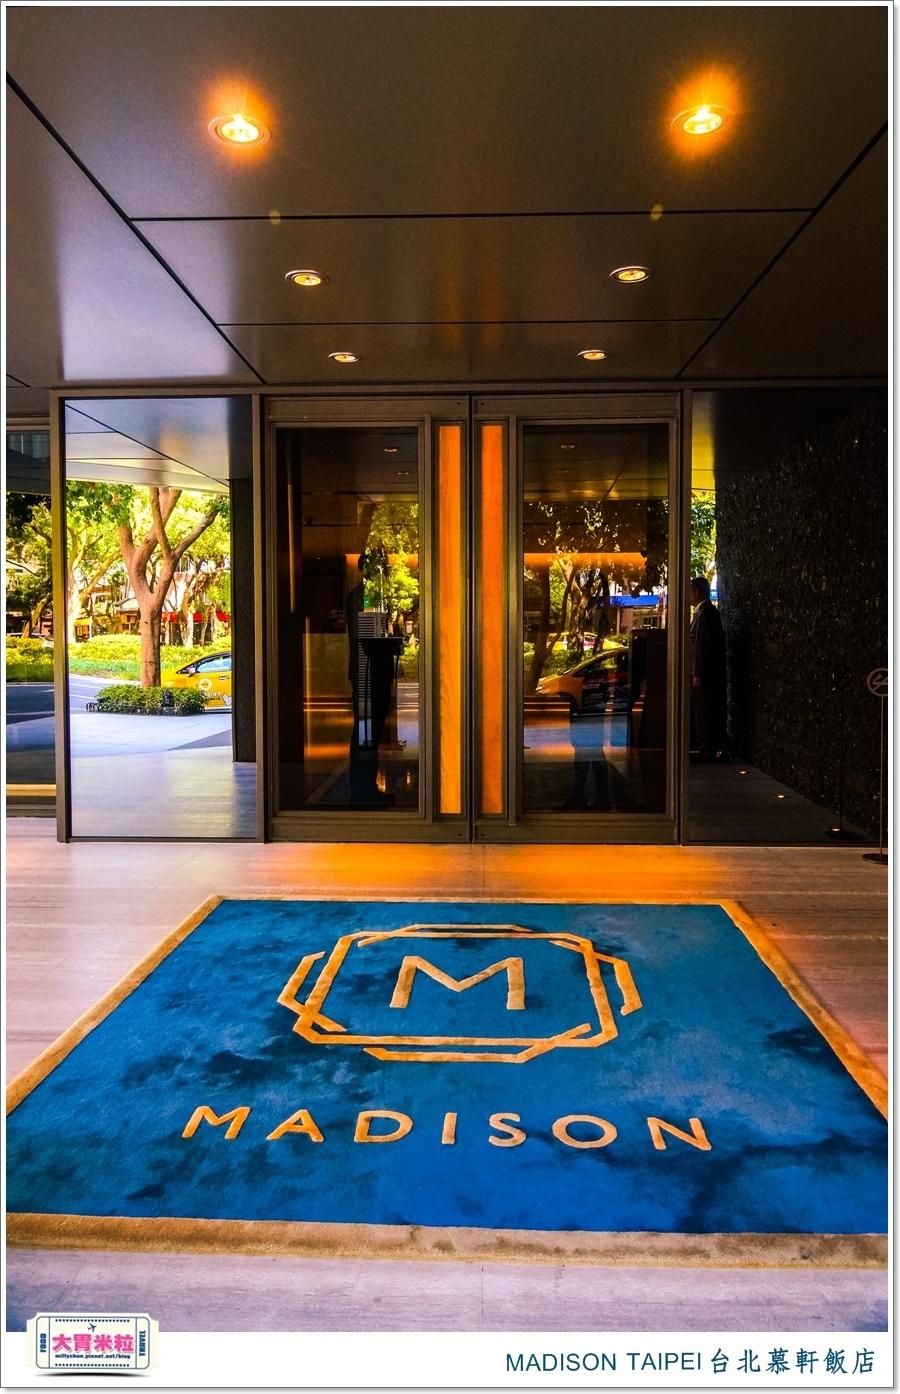 MADISON TAIPEI台北慕軒飯店@大胃米粒0007.jpg